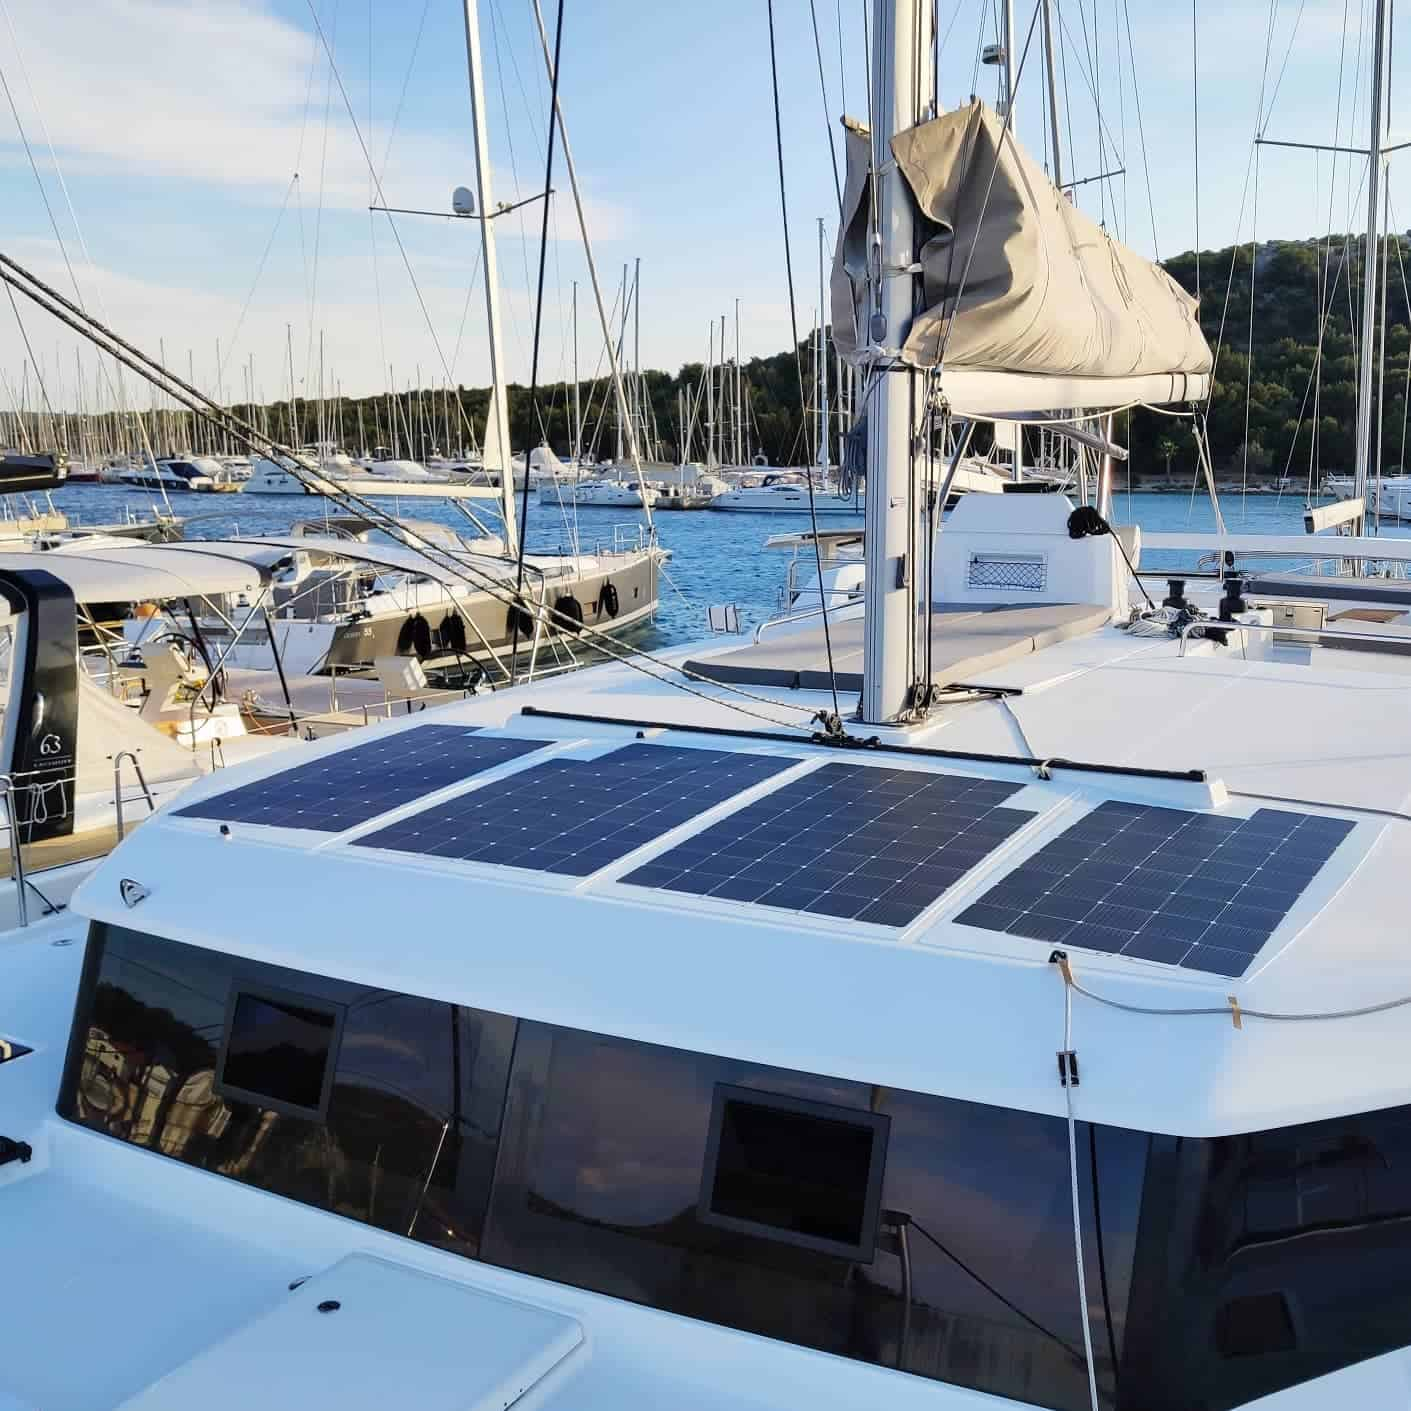 Dufour 48 Catamaran Solar Photovoltaics walkable Solbian